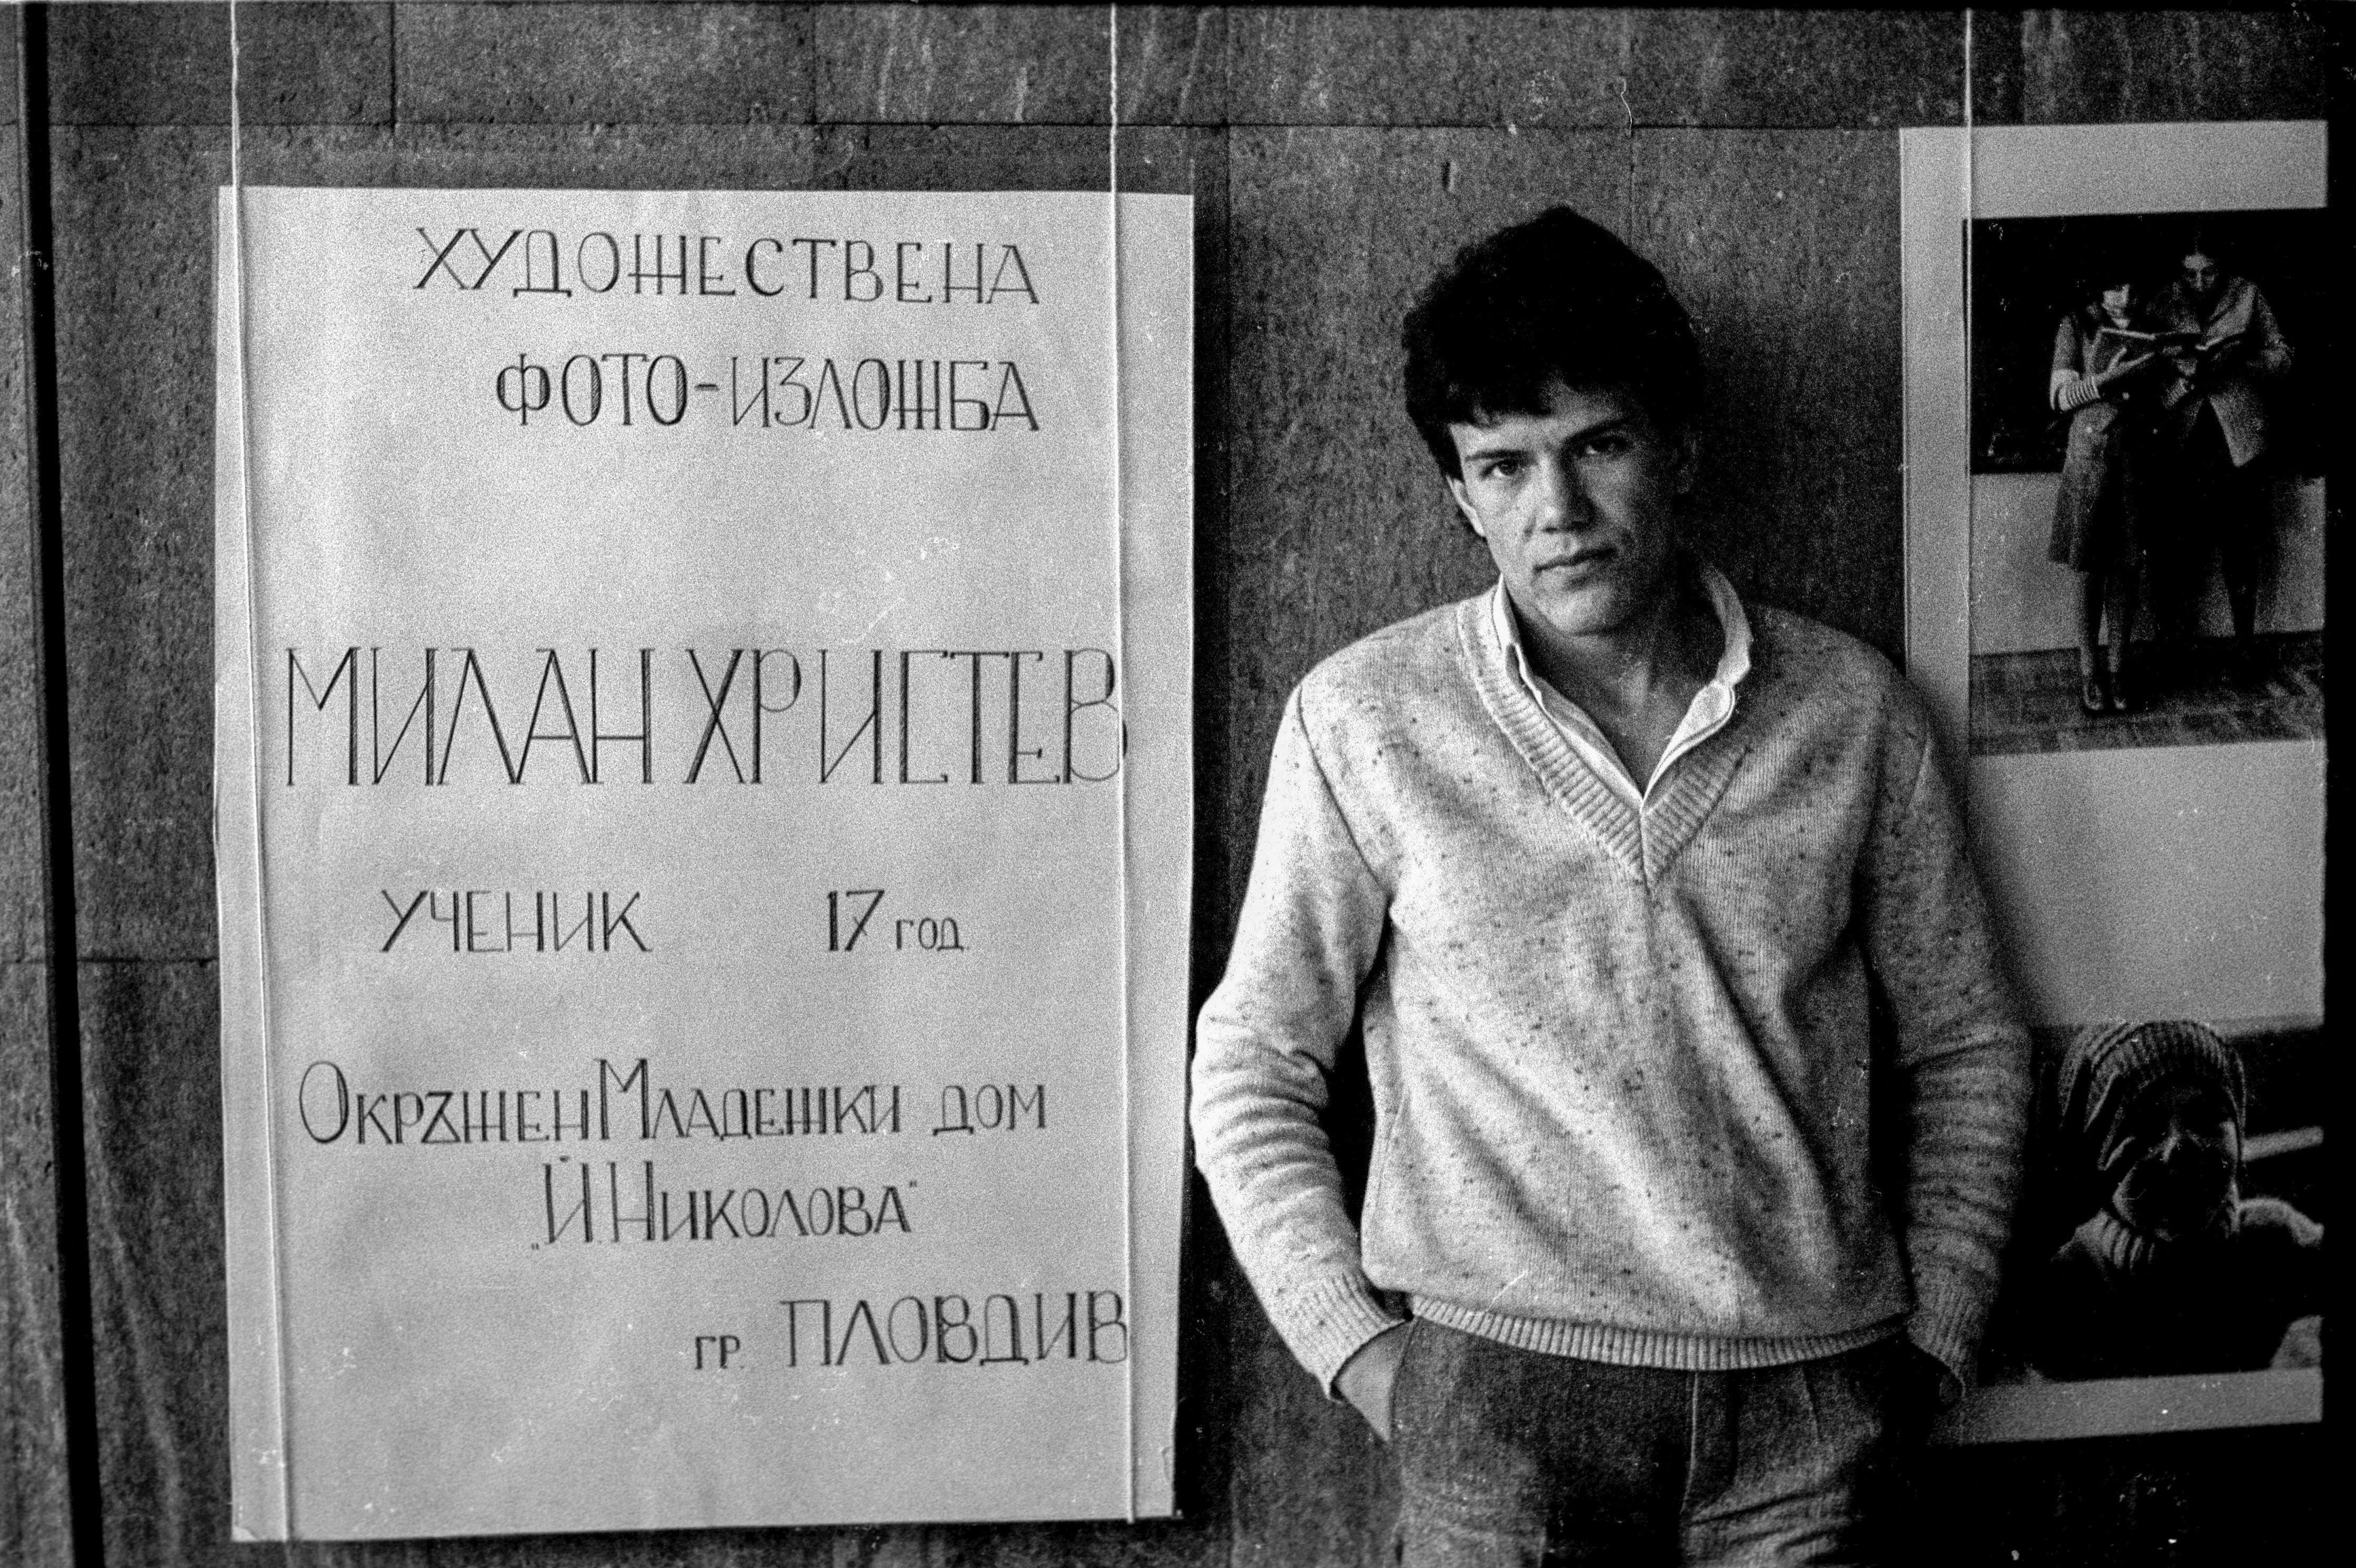 Милан Христев